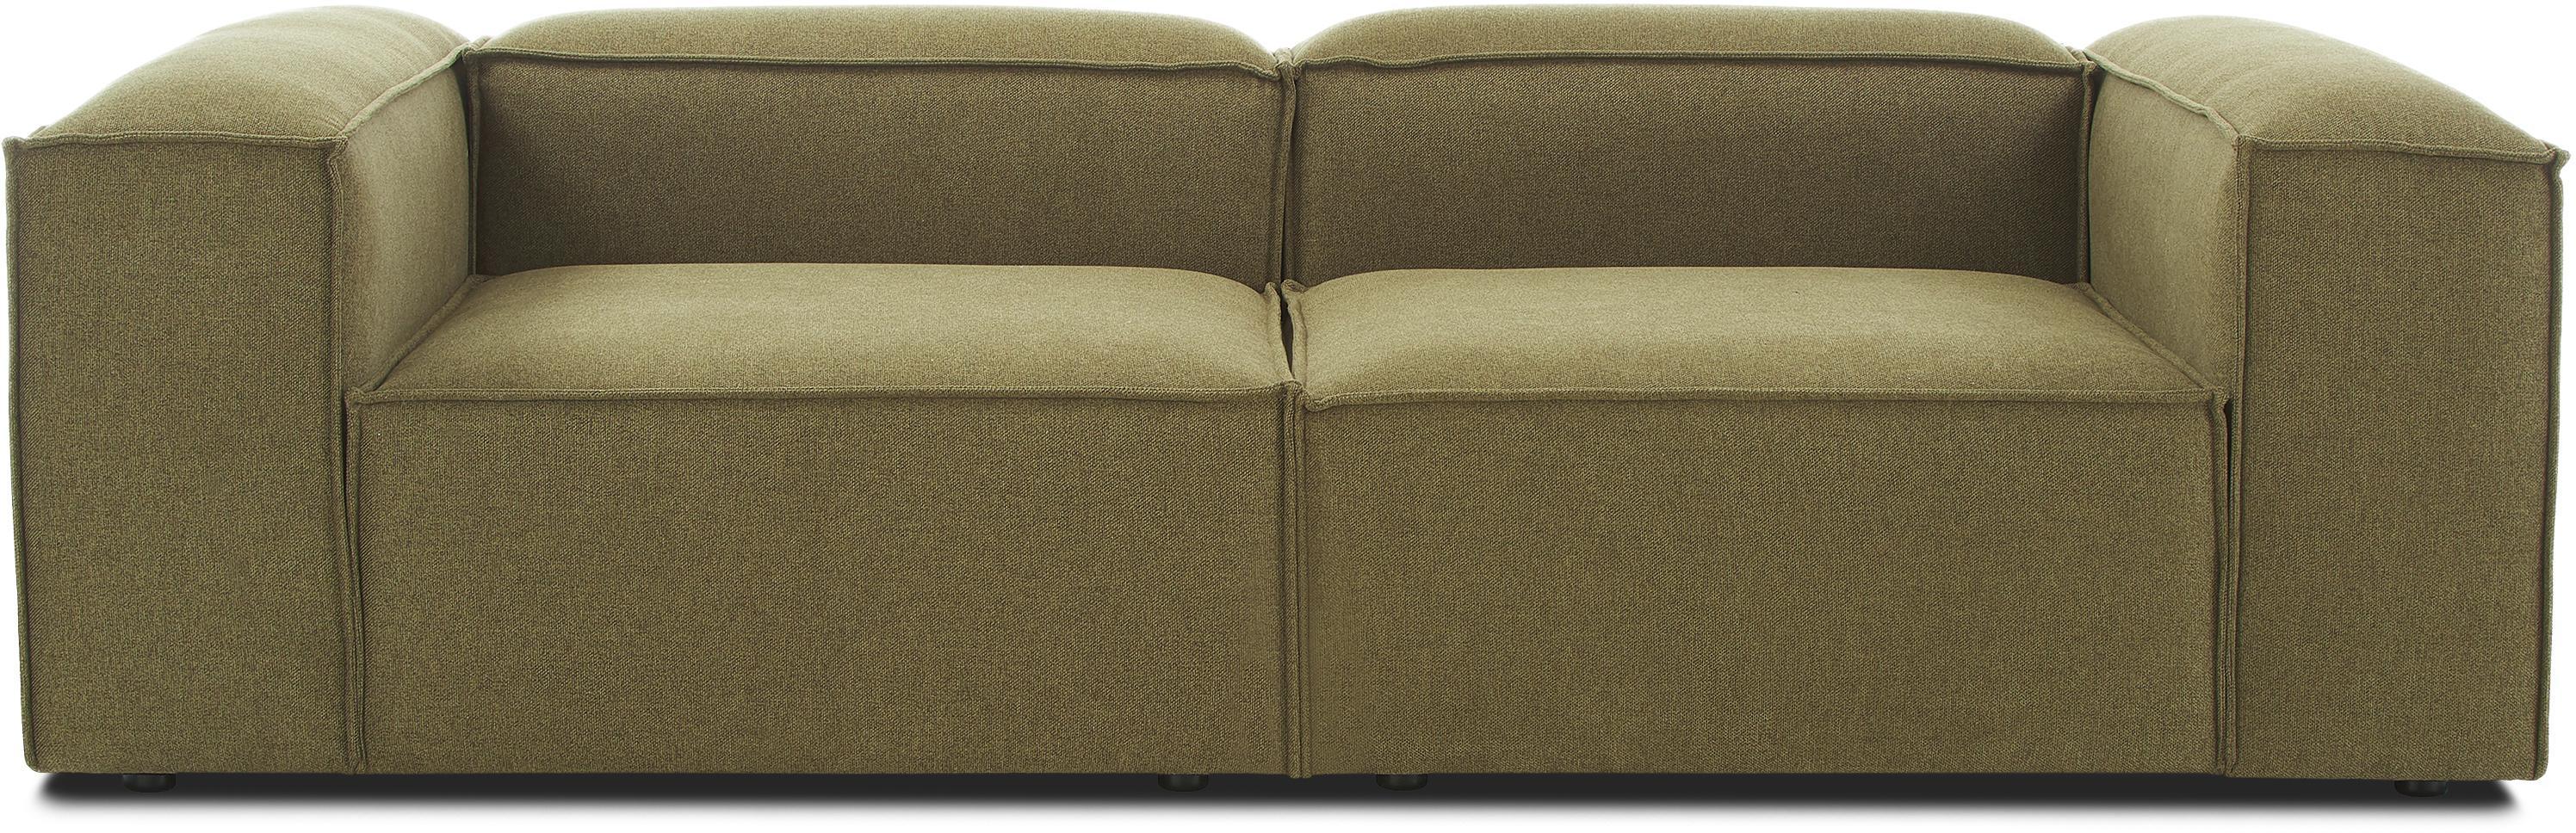 Modulares Sofa Lennon (3-Sitzer), Bezug: Polyester Der hochwertige, Gestell: Massives Kiefernholz, Spe, Webstoff Grün, B 238 x T 119 cm